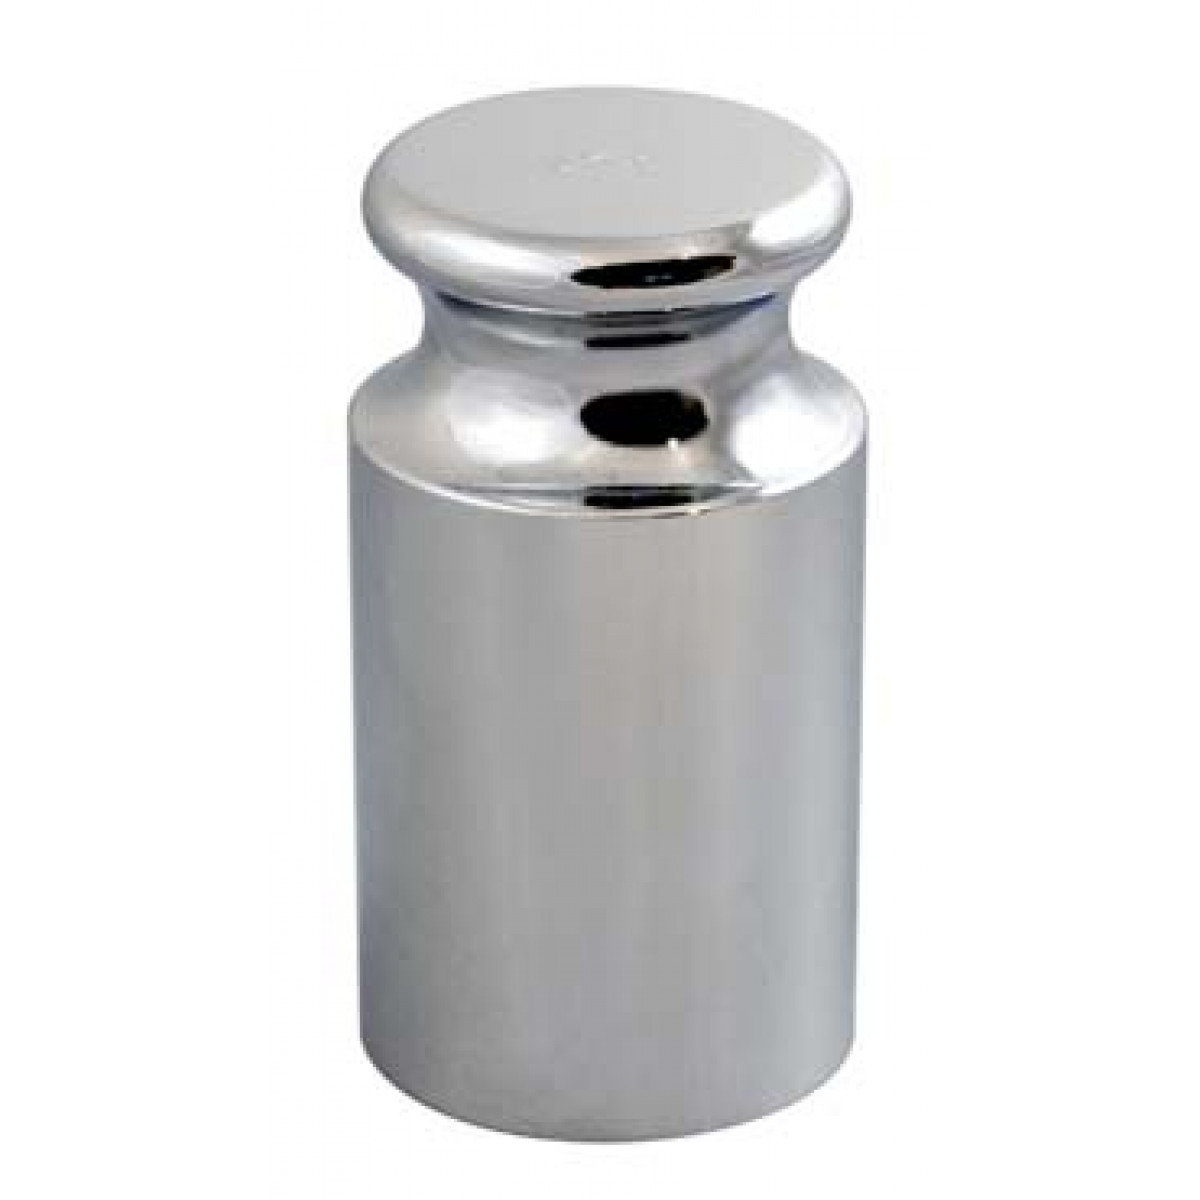 Kalibreringslod - Kapacitet 300 gr. Standard